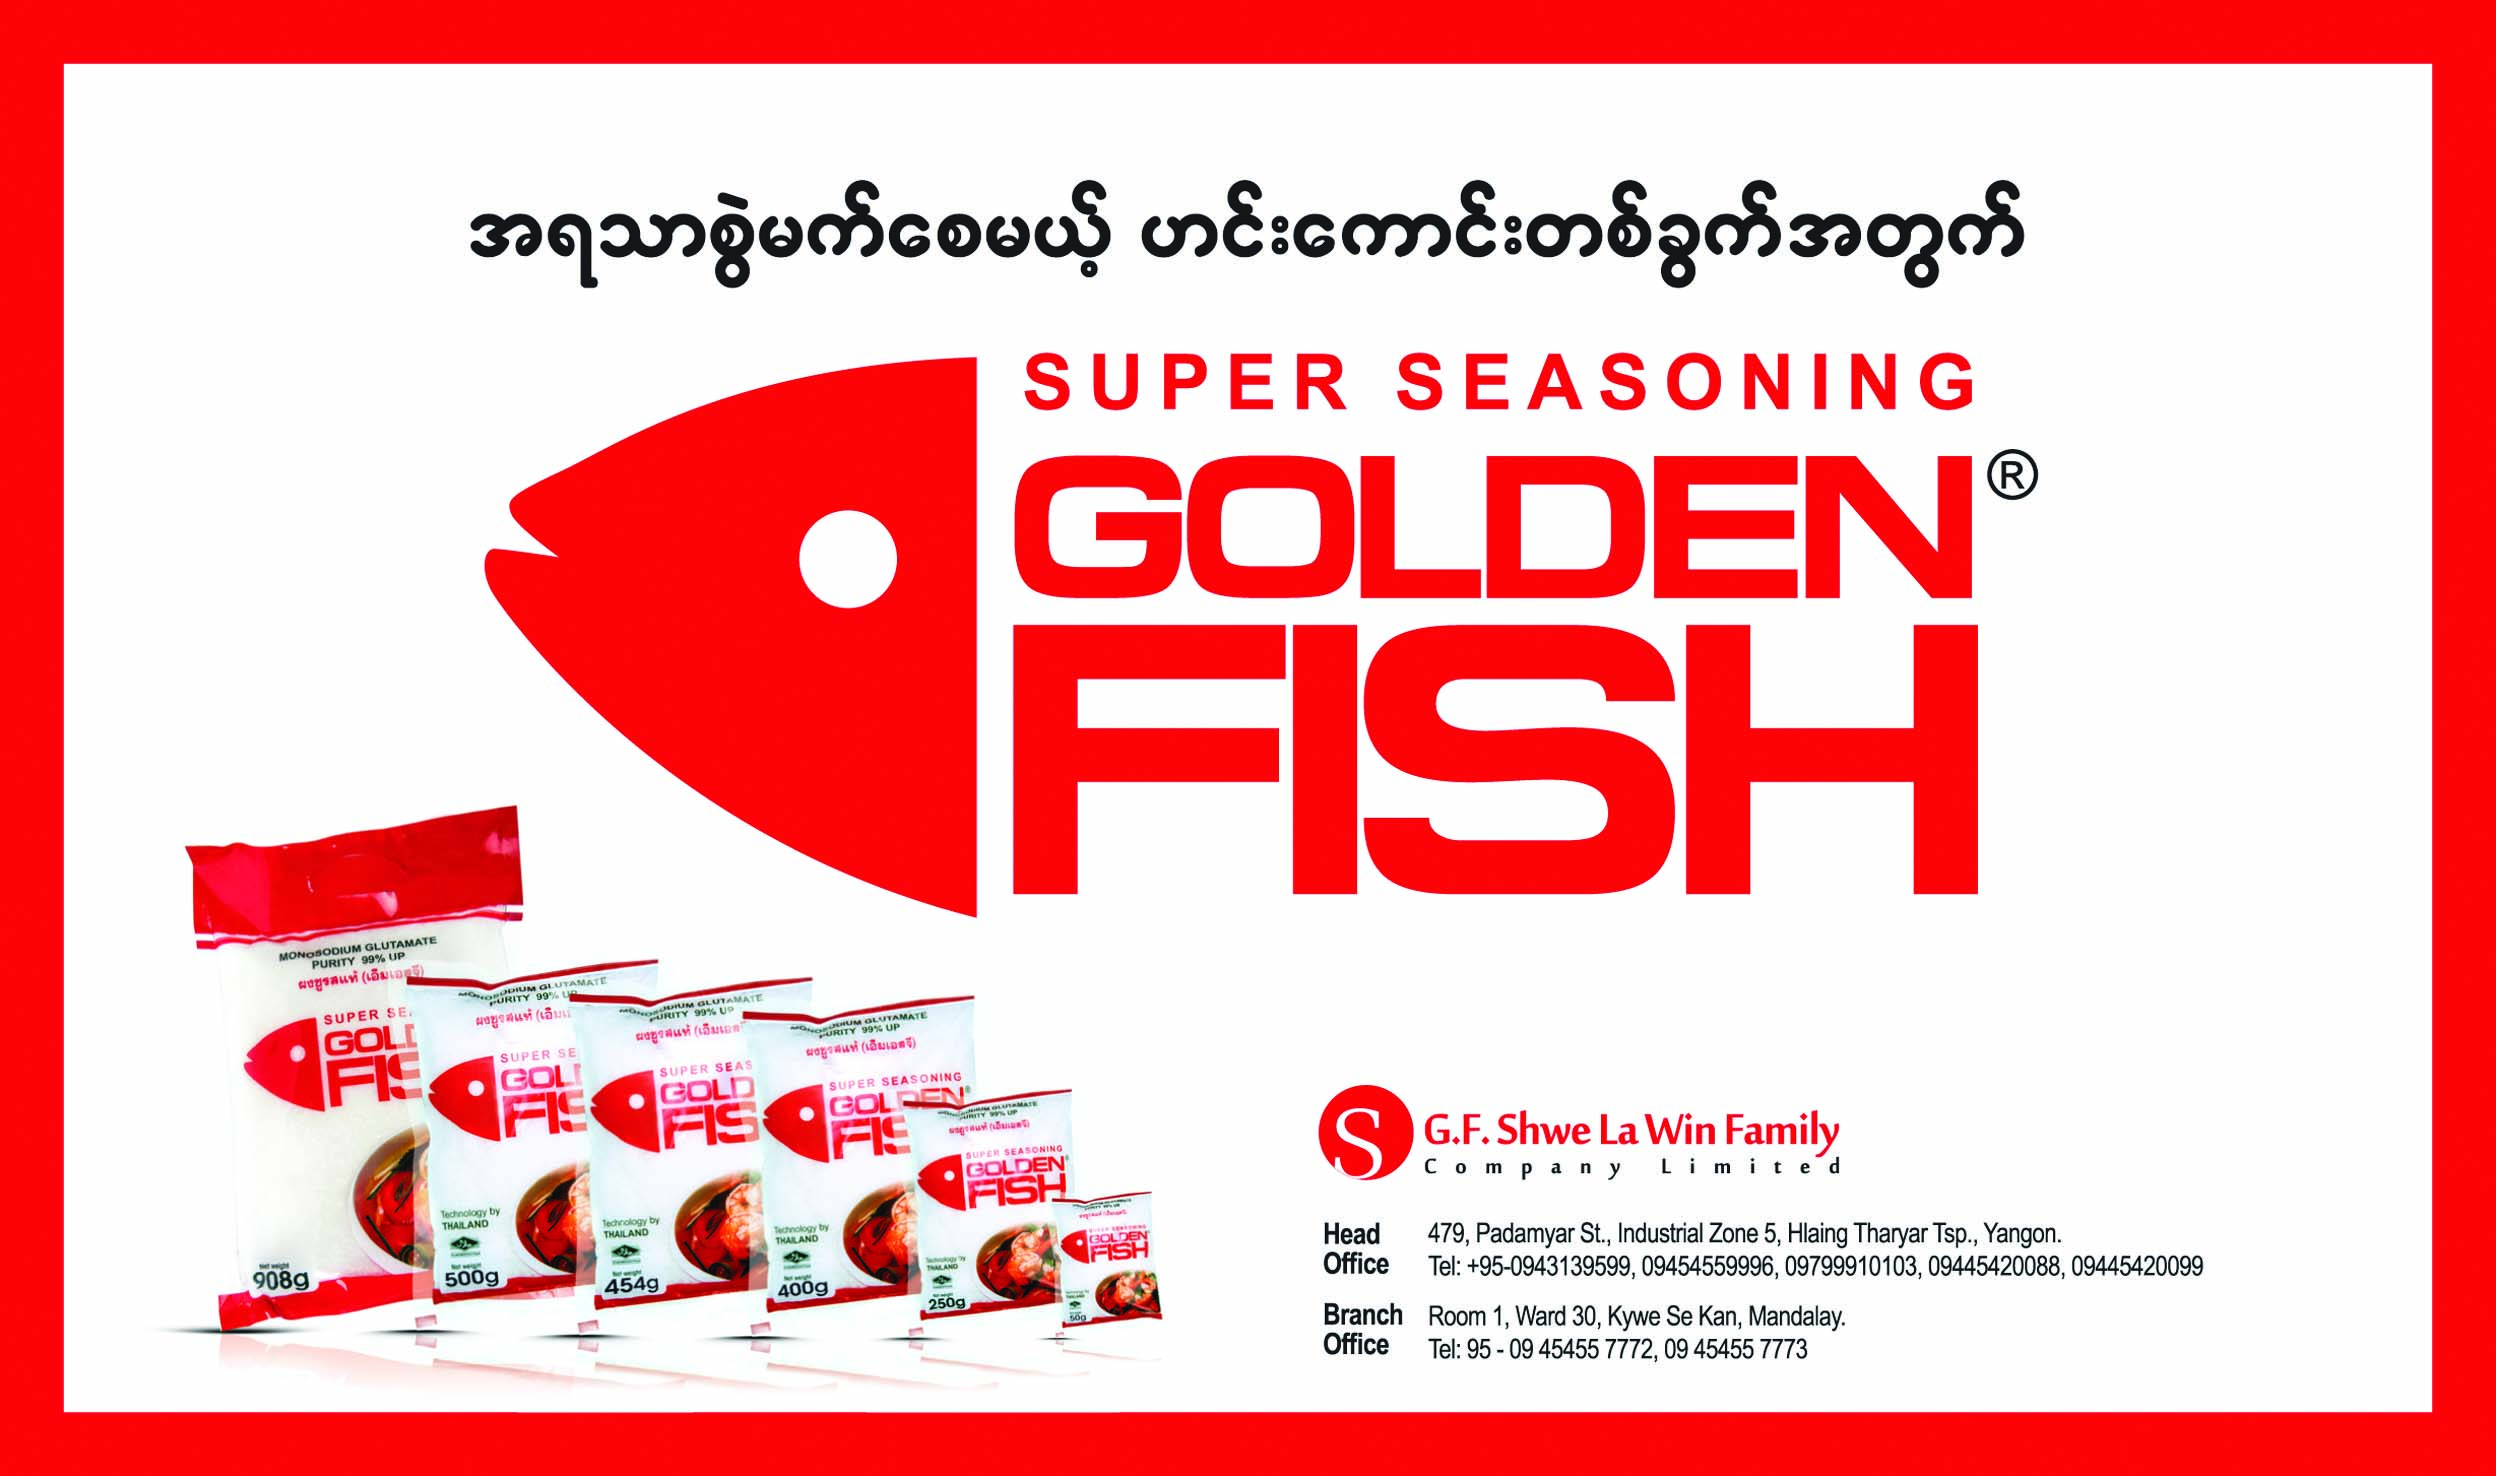 Golden Fish (G.F.Shwe La Win Family)Foodstuffs